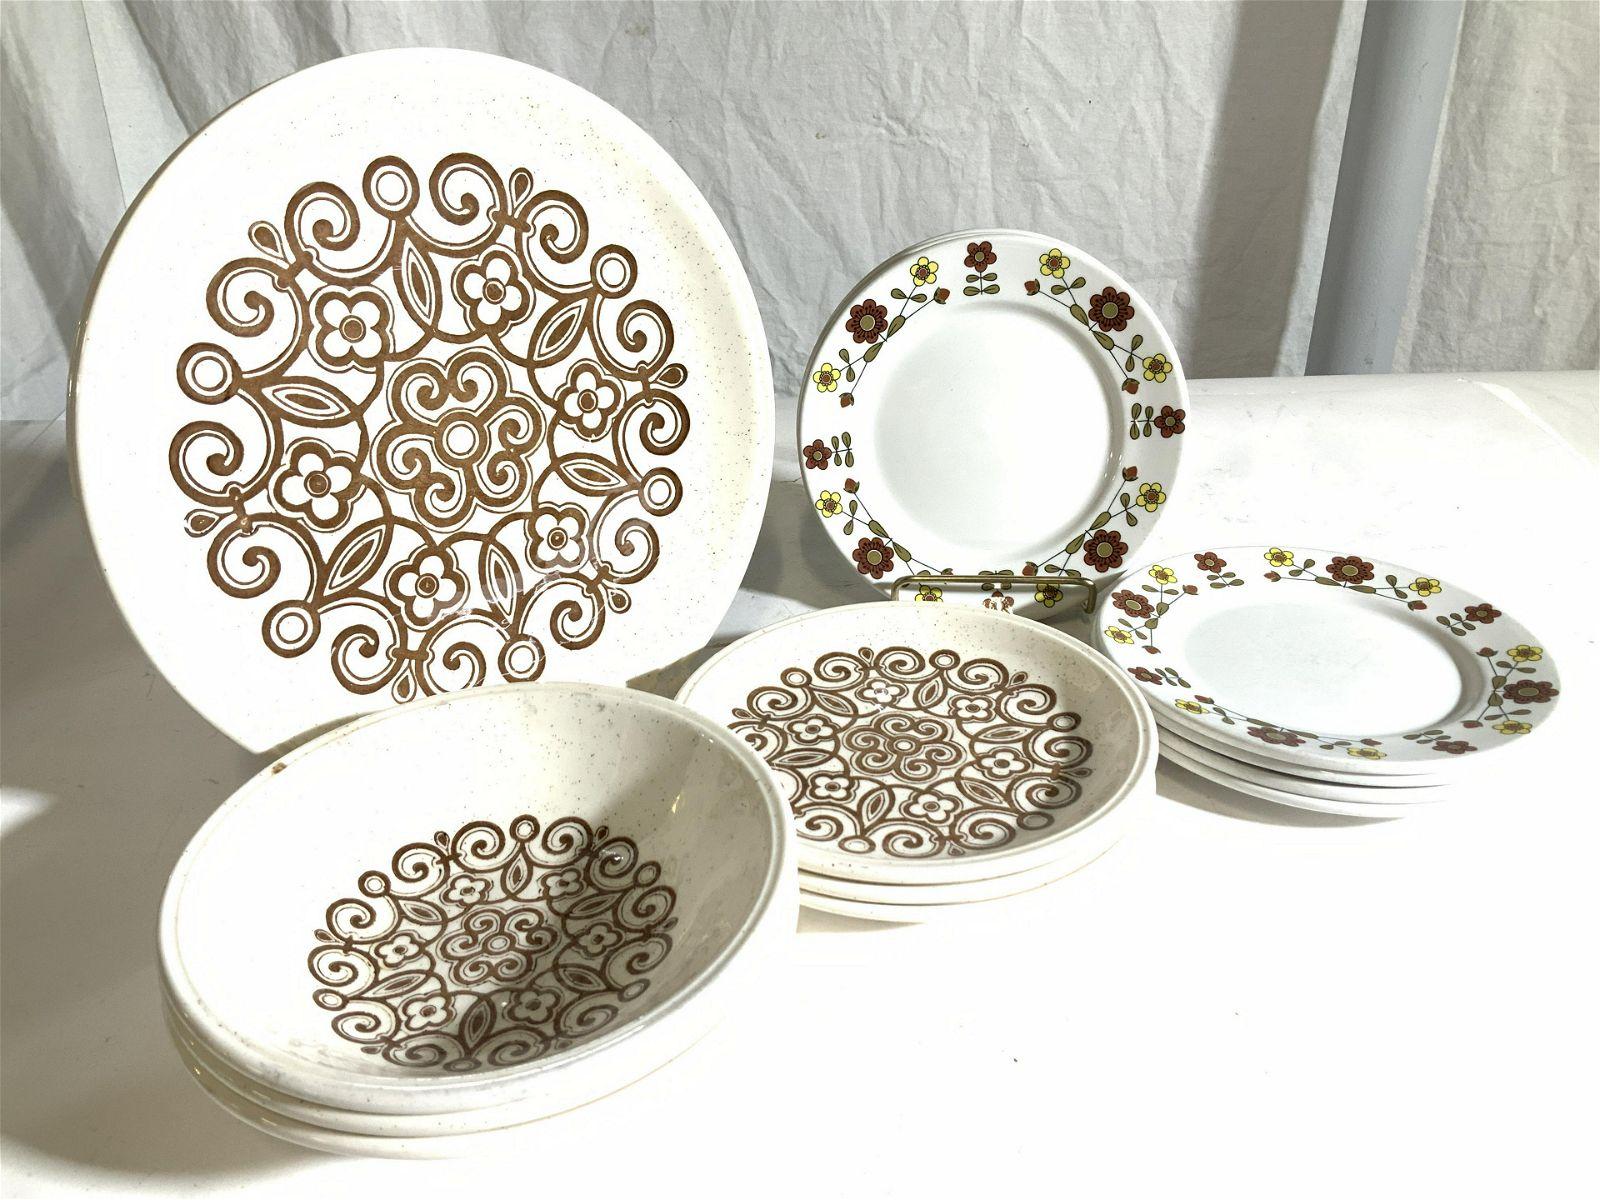 Biltons & Duralung Ironstone plates, 17, England